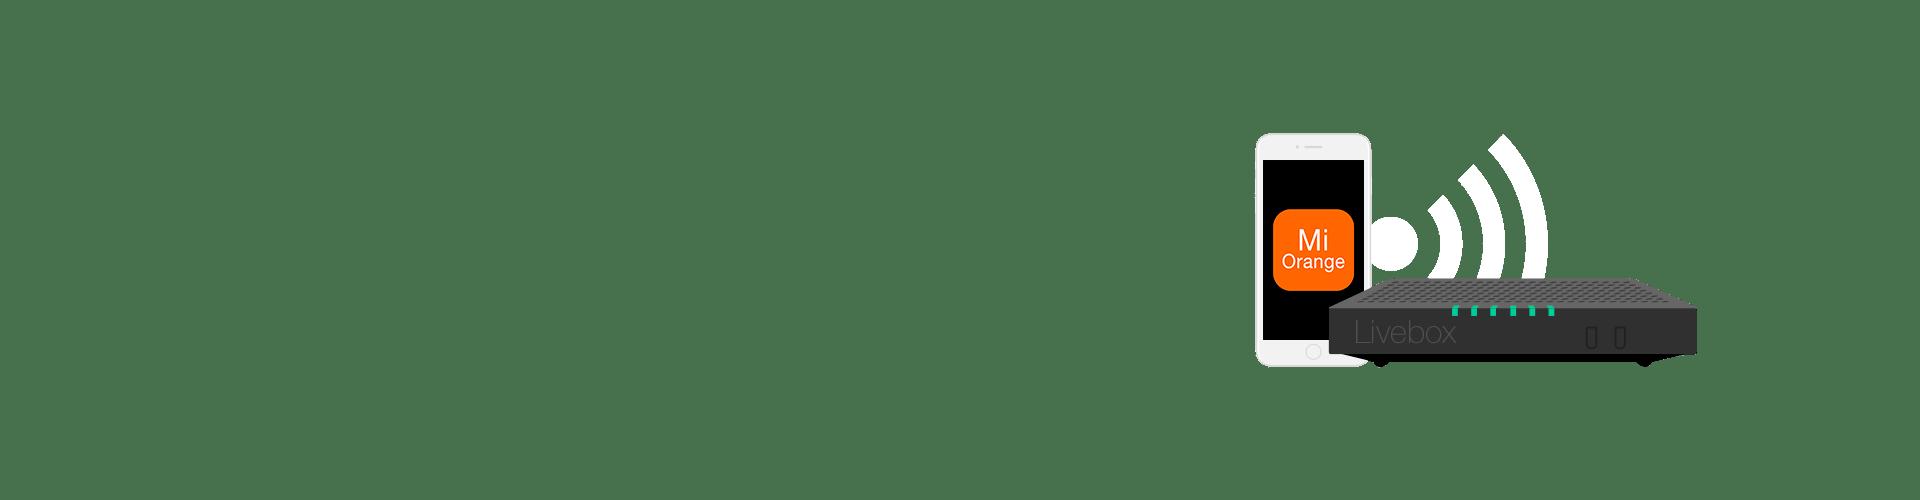 Imagen Modelo Router Livebox Apps